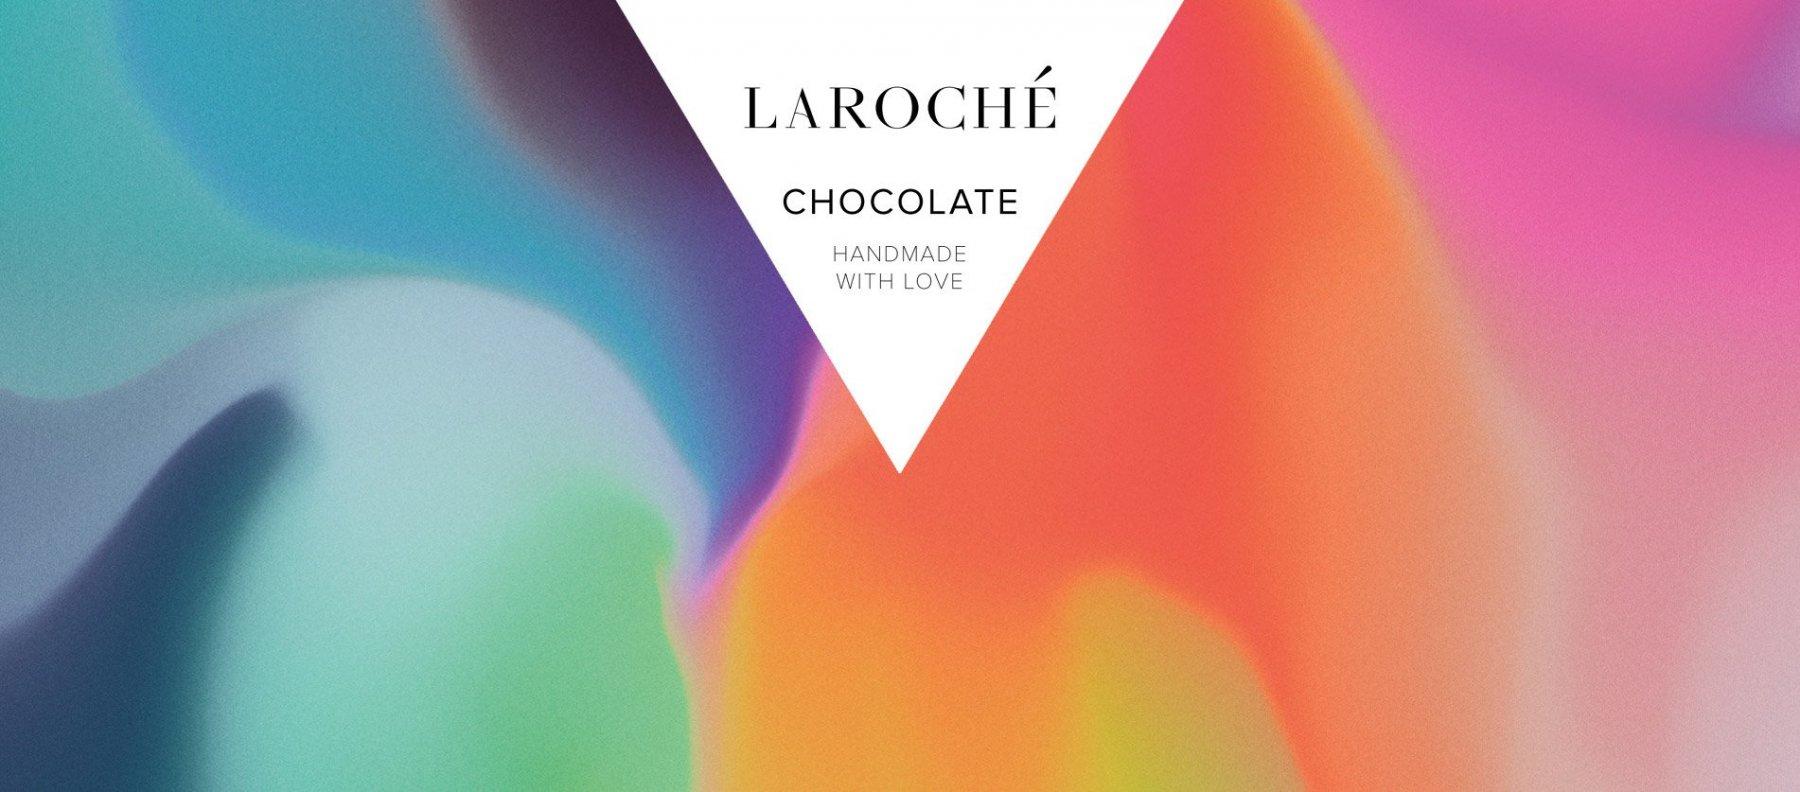 Laroche-Chocolate-Packaging-by-Martin-Naumann-12